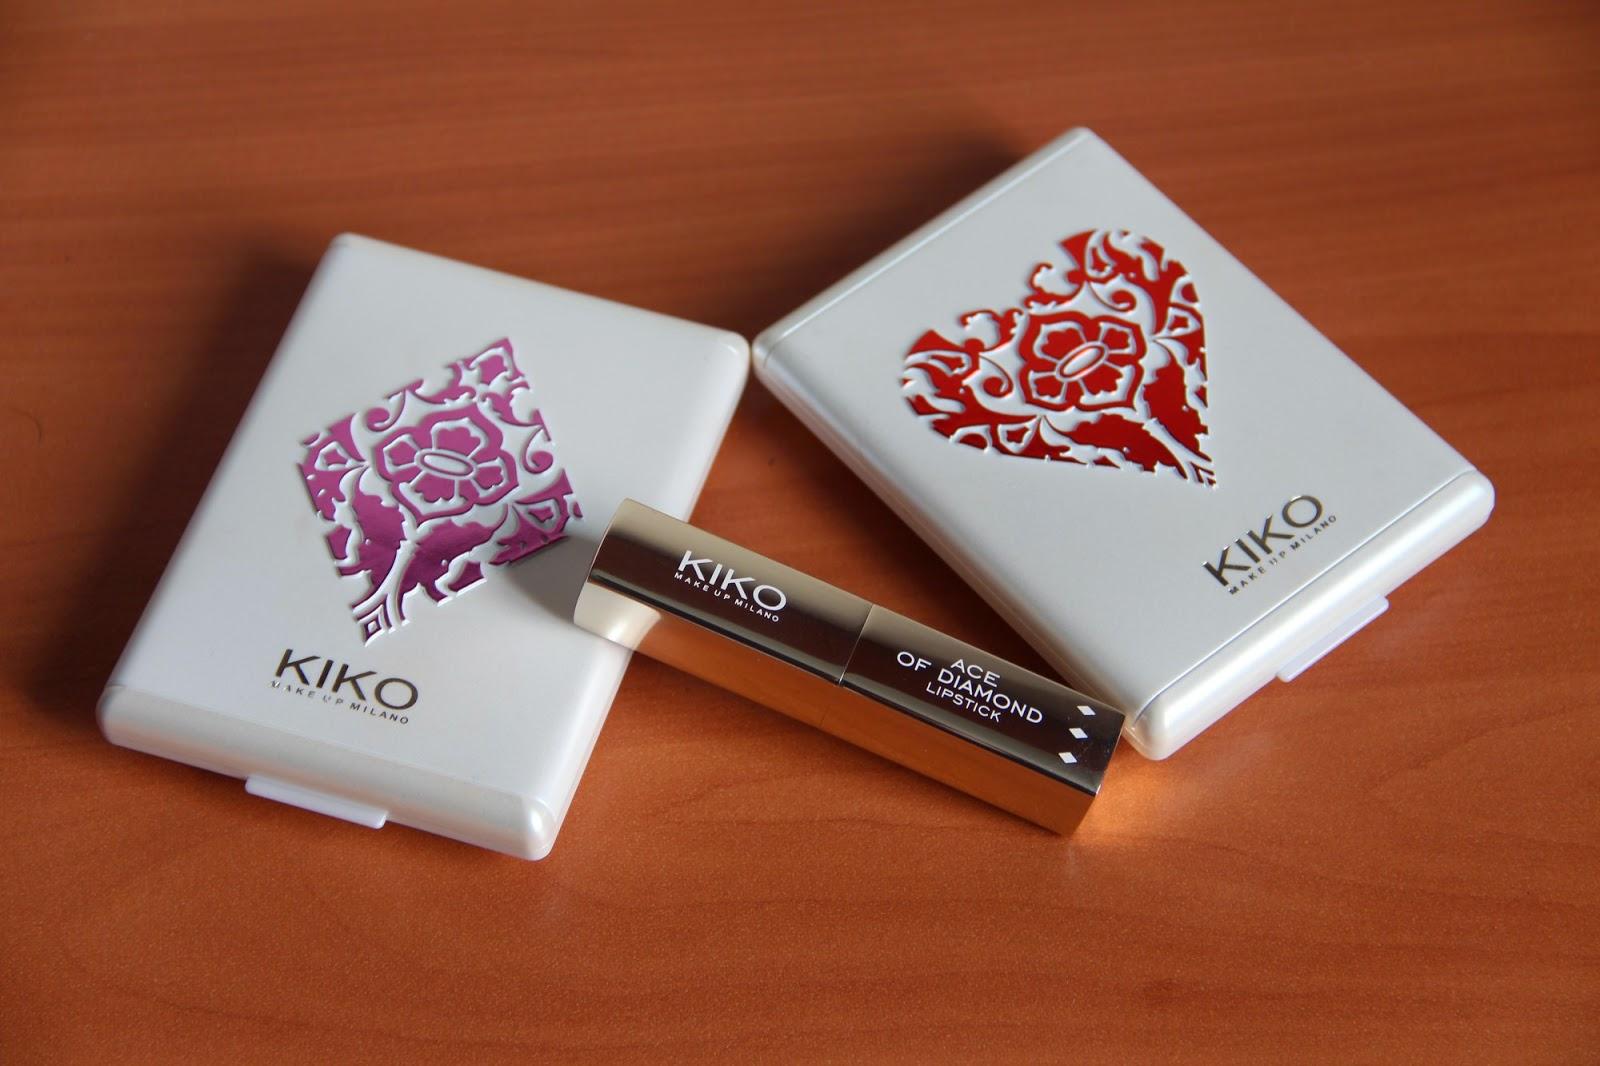 Kiko cosmetique